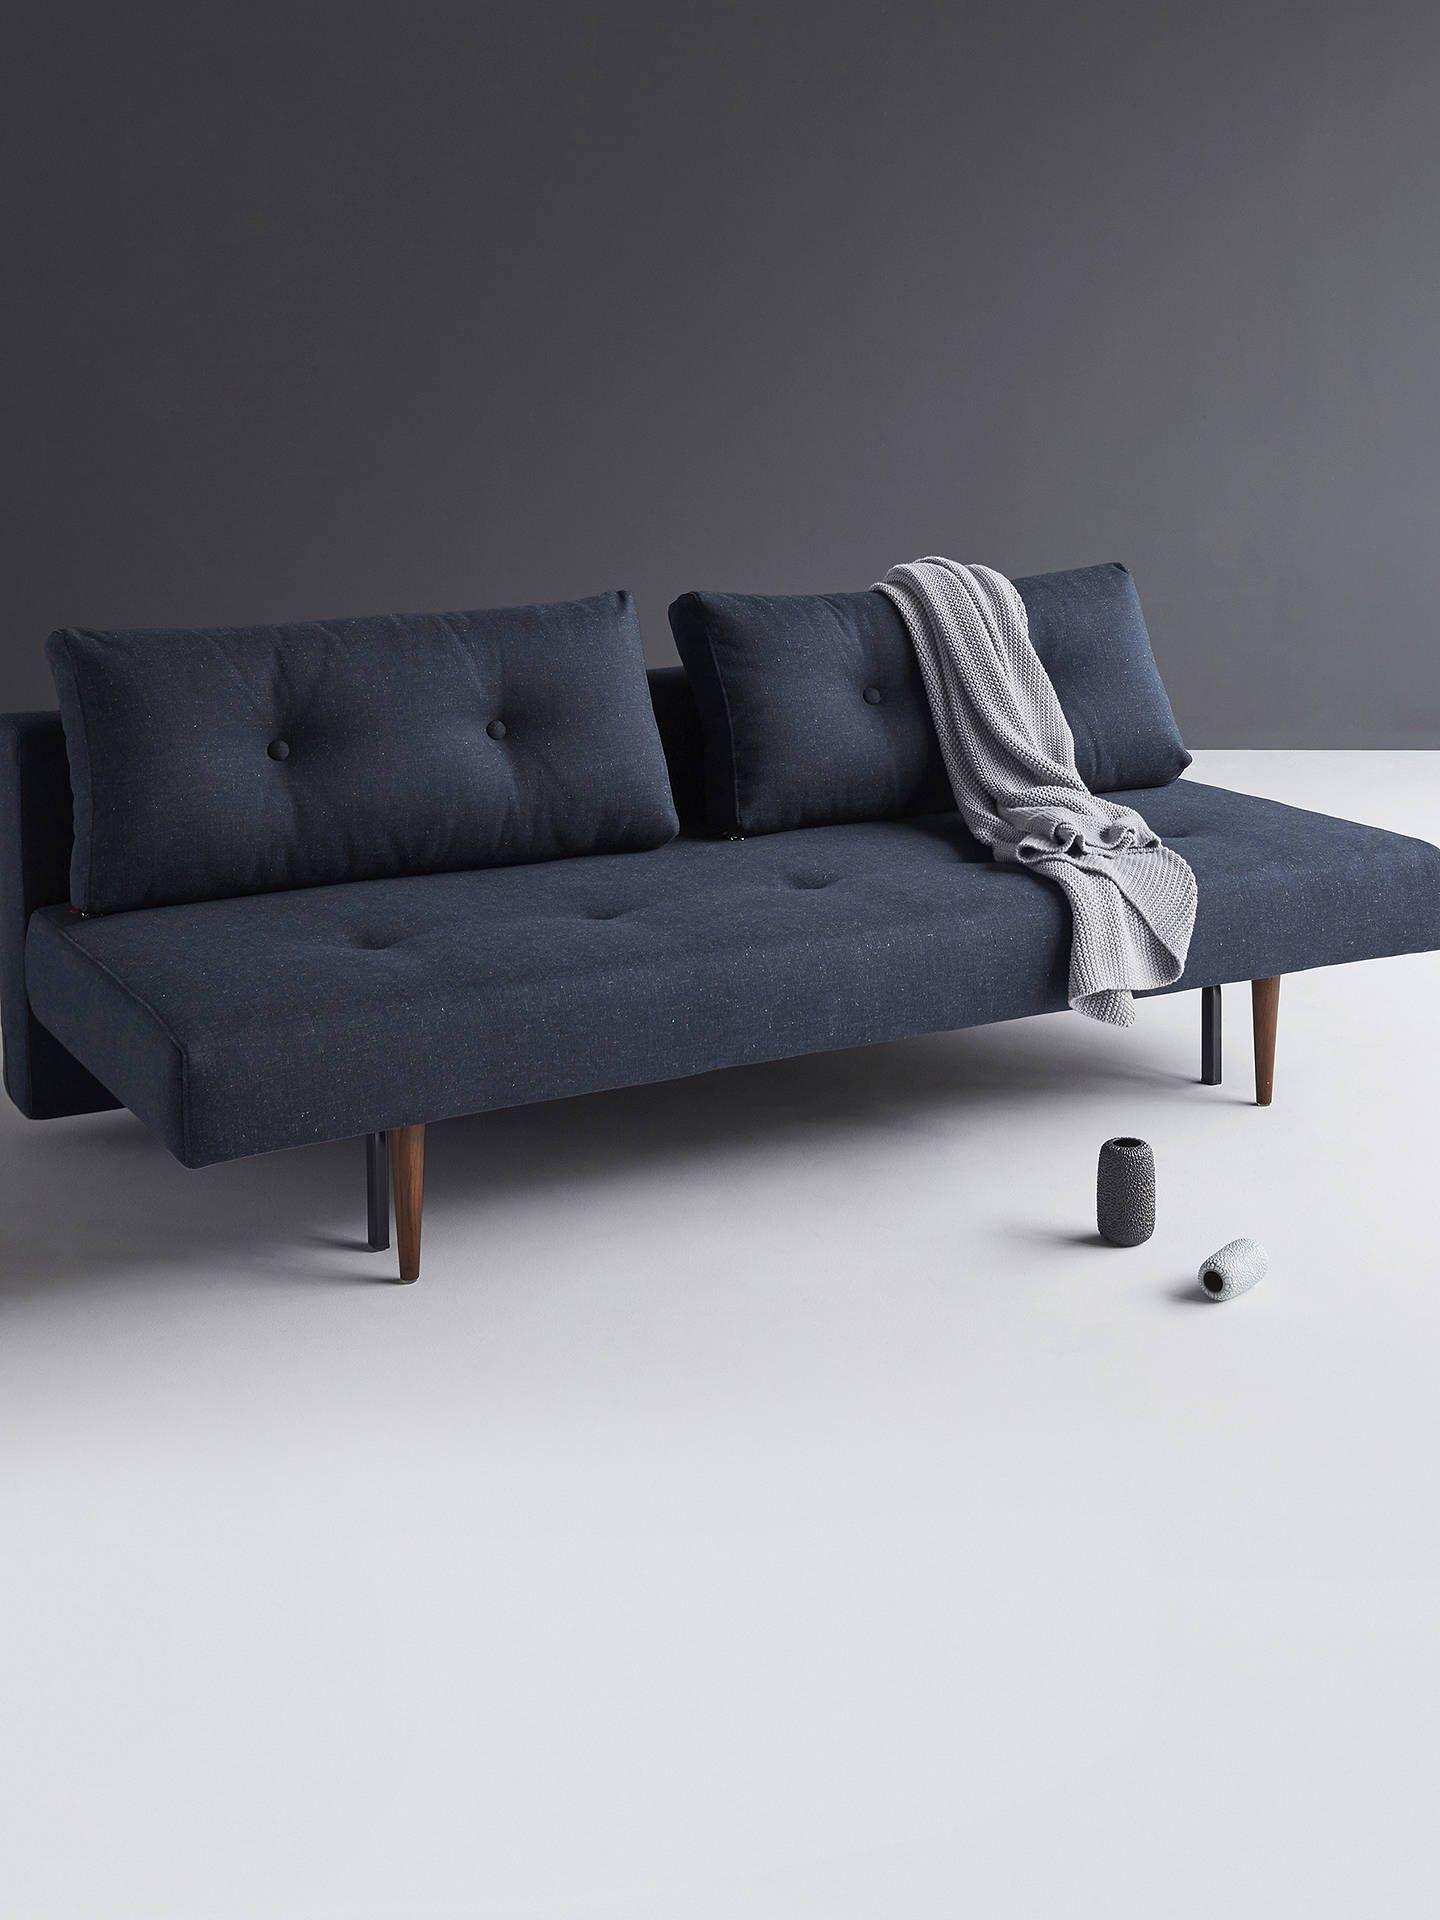 Innovation Living Recast Sofa Bed With Pocket Sprung Mattress